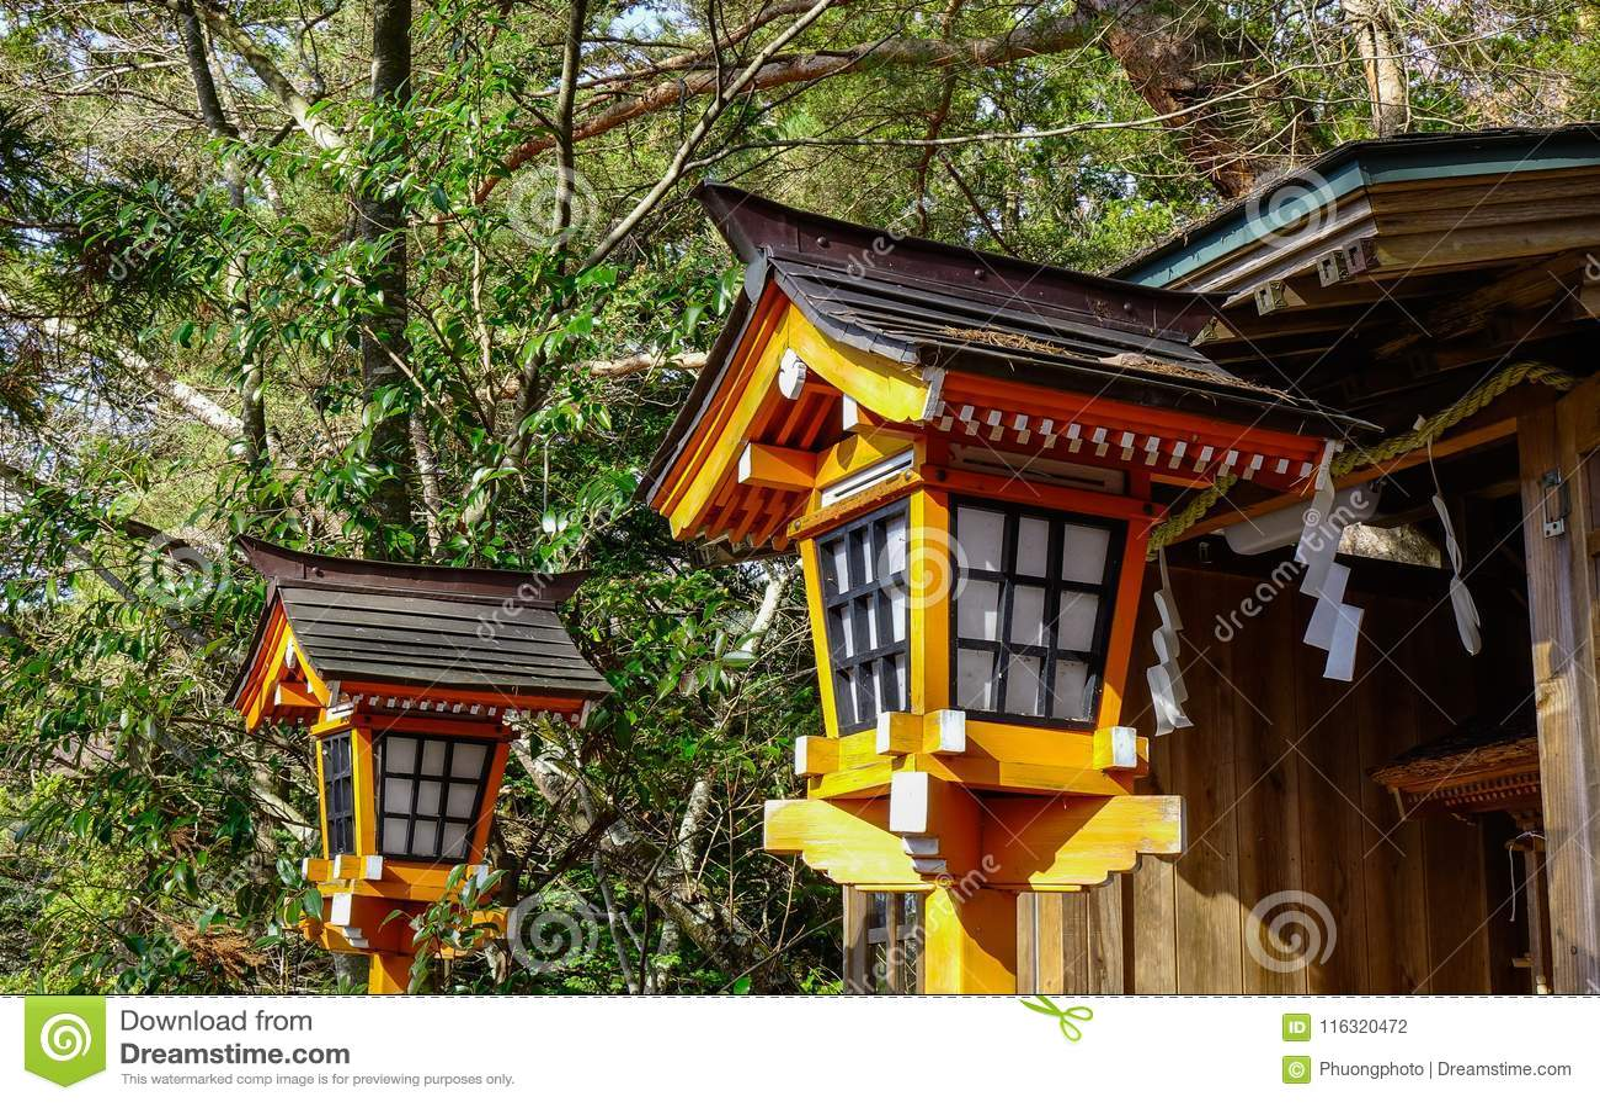 Wooden Traditional Japanese Lantern Stock Photo Image Of Kyoto